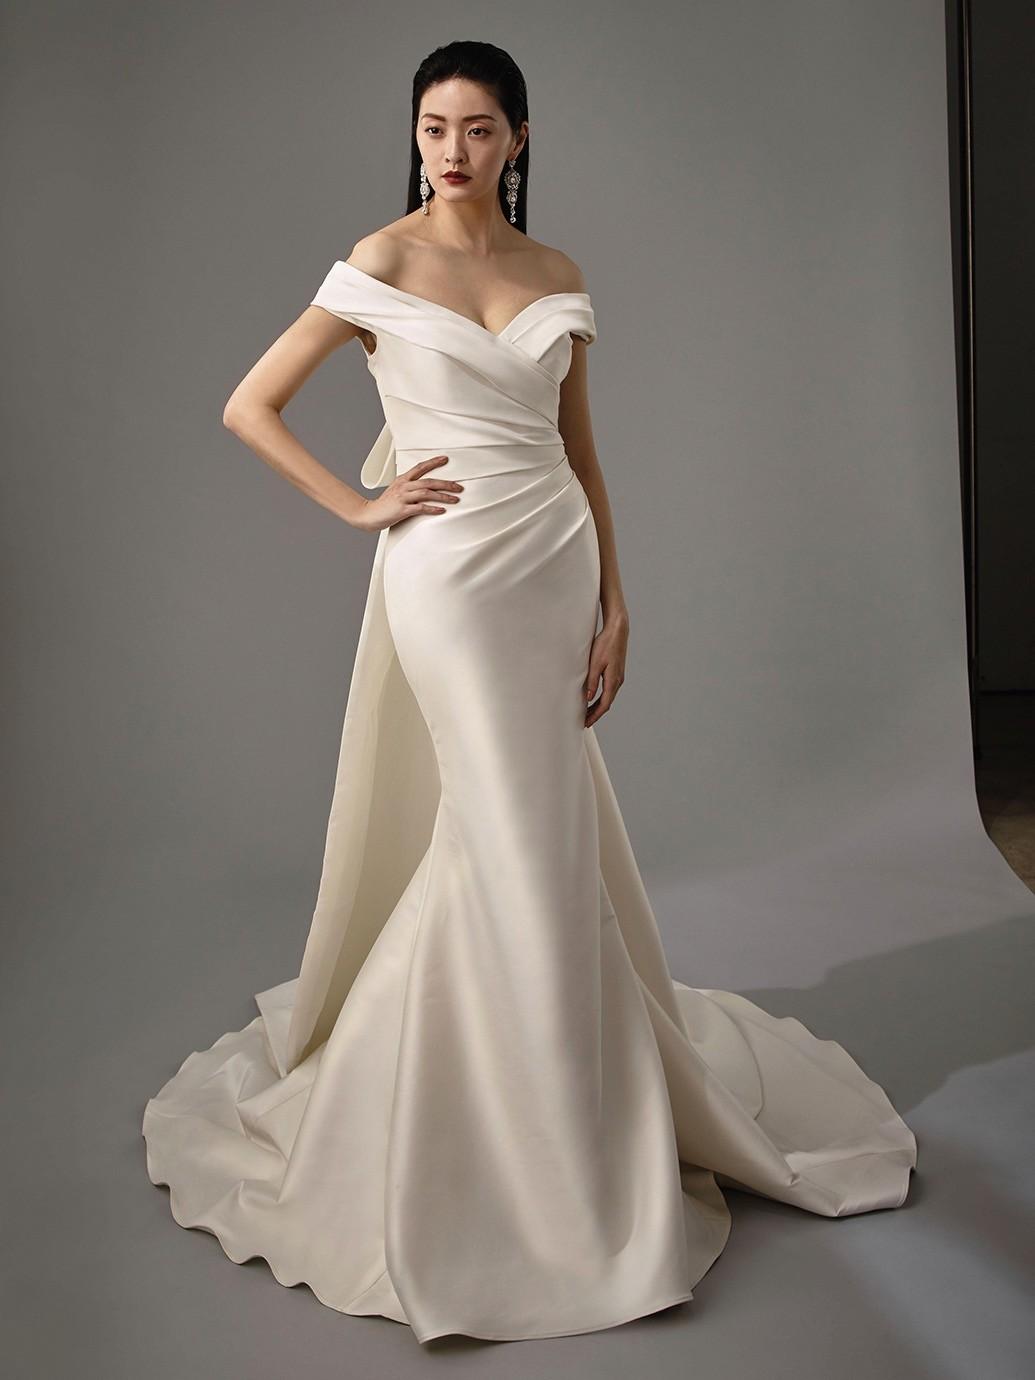 Brautkleid Modell Maria aus der Blue by Enzoani Kollektion 2020